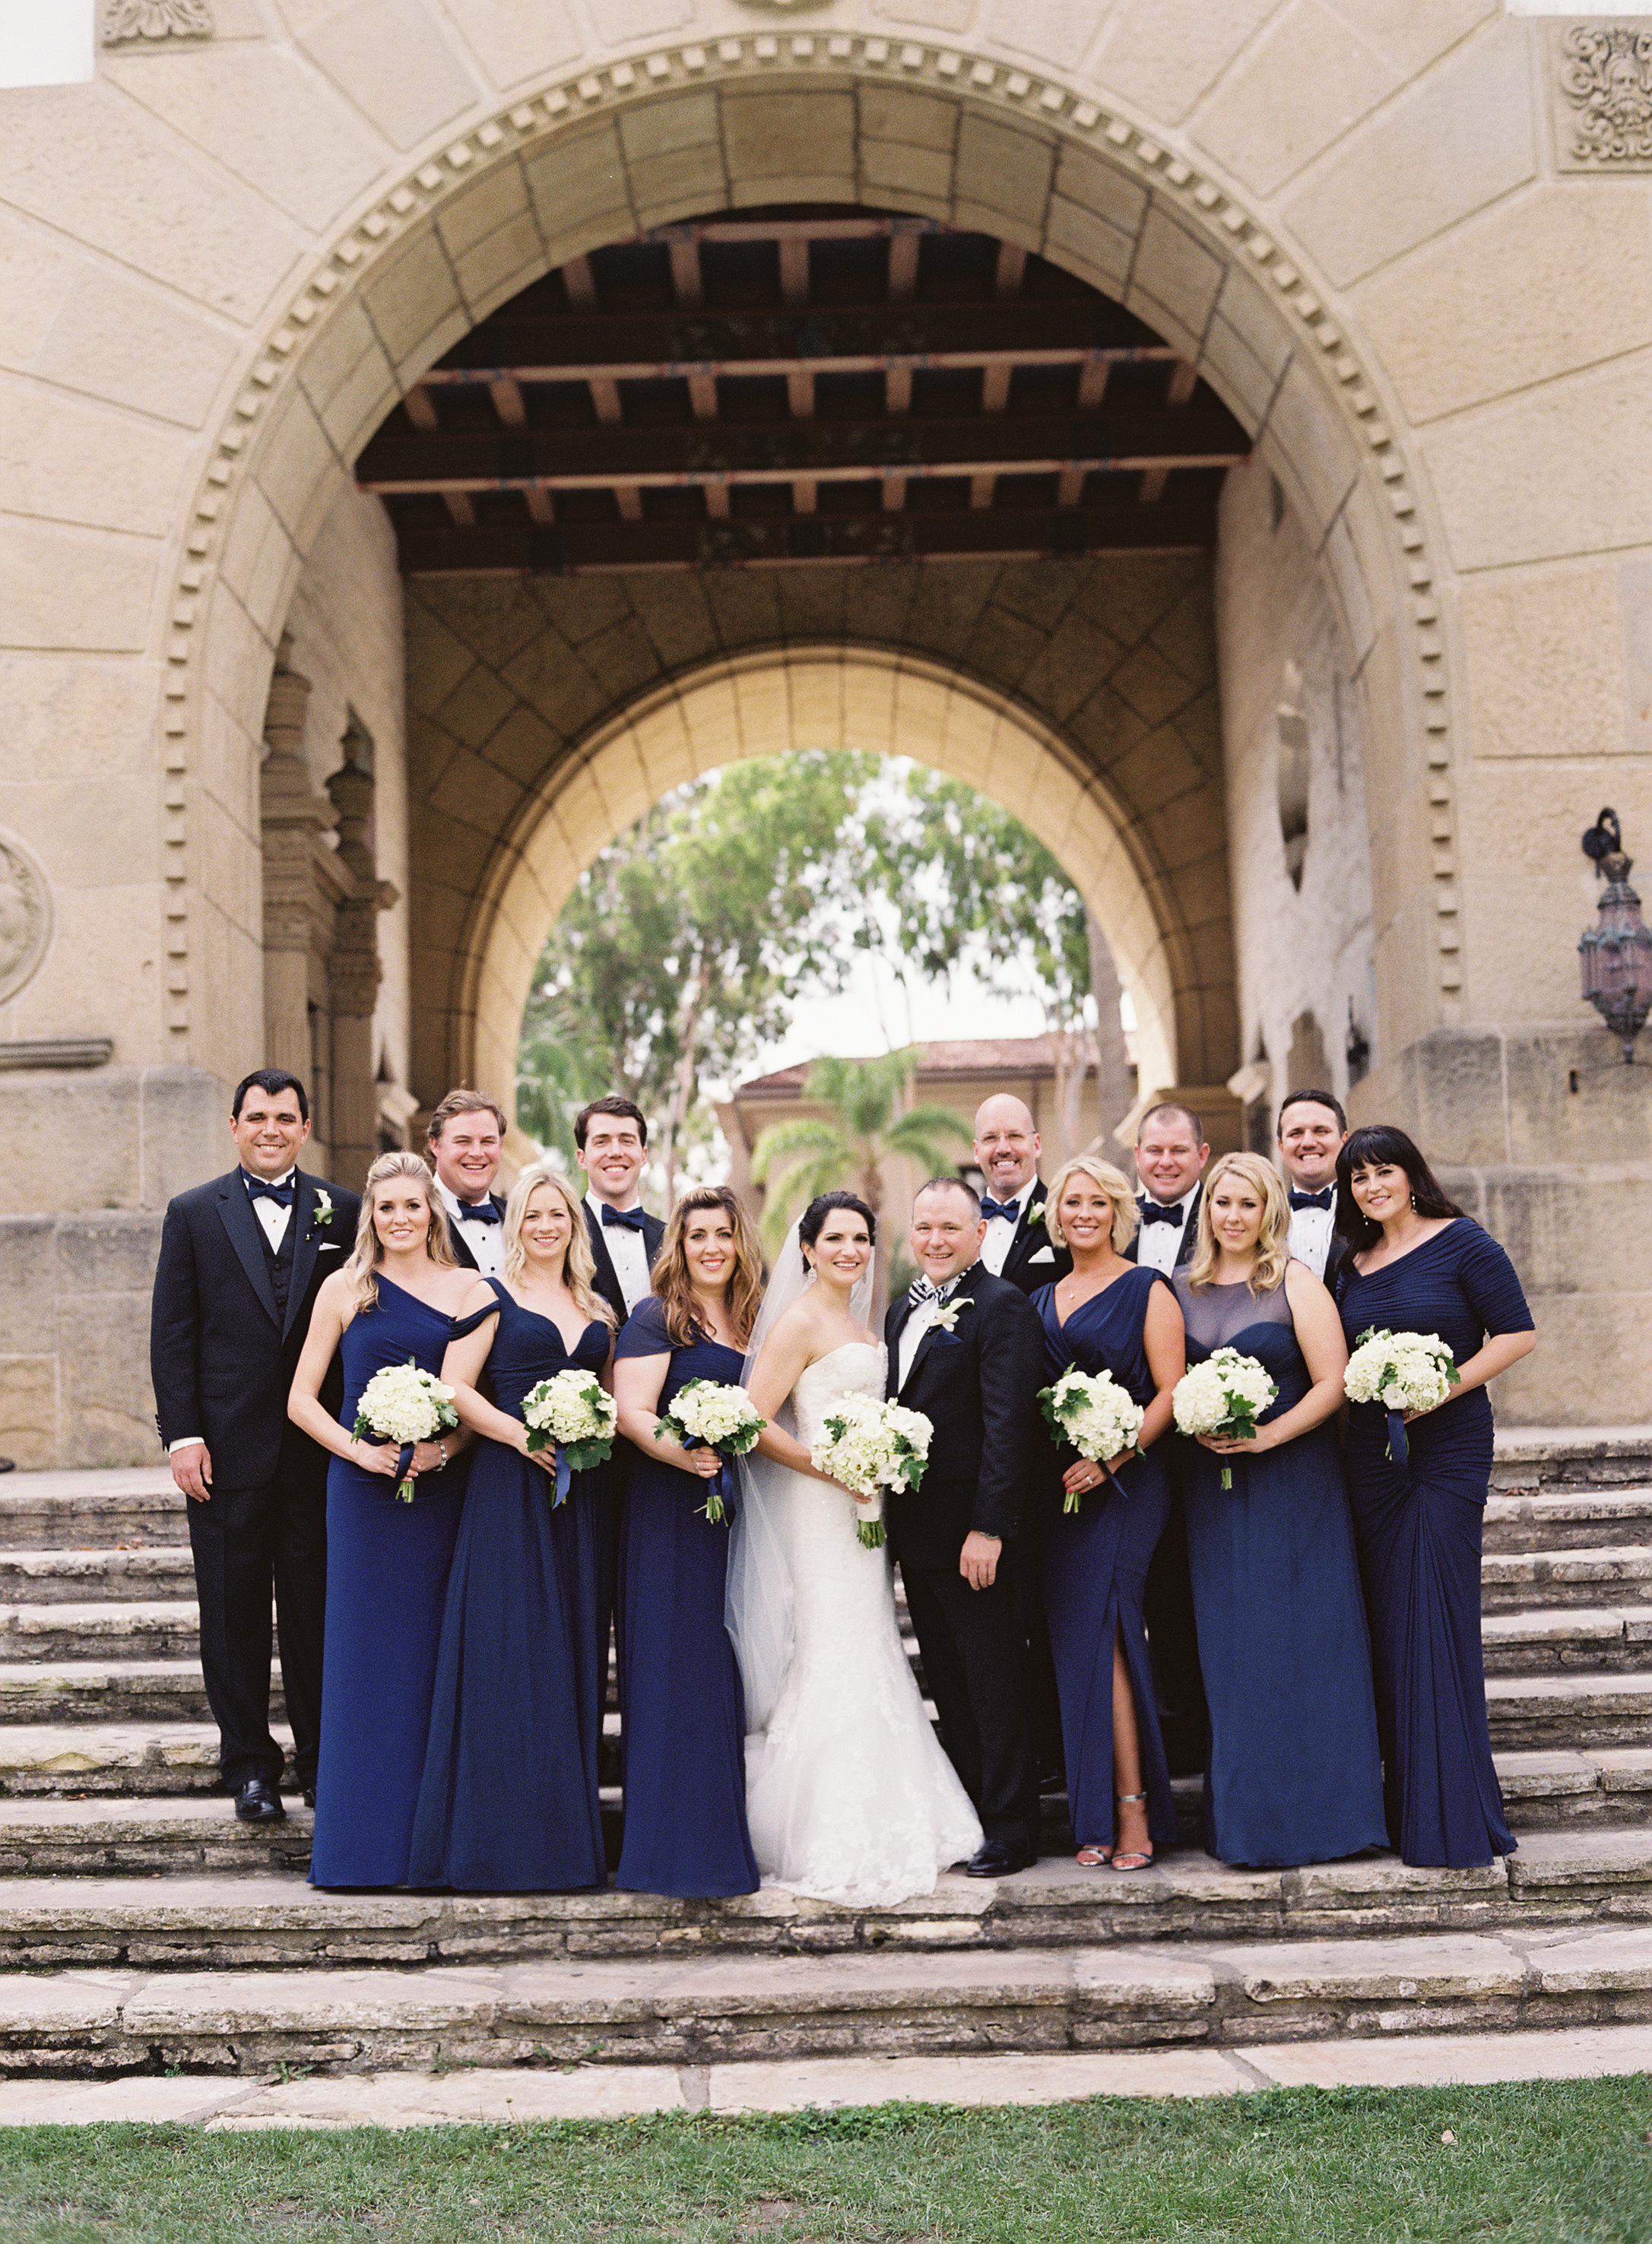 www.santabarbarawedding.com | Linda Chaja Photography | Santa Barbara Museum of Natural History Sea Center | Bridesmaids